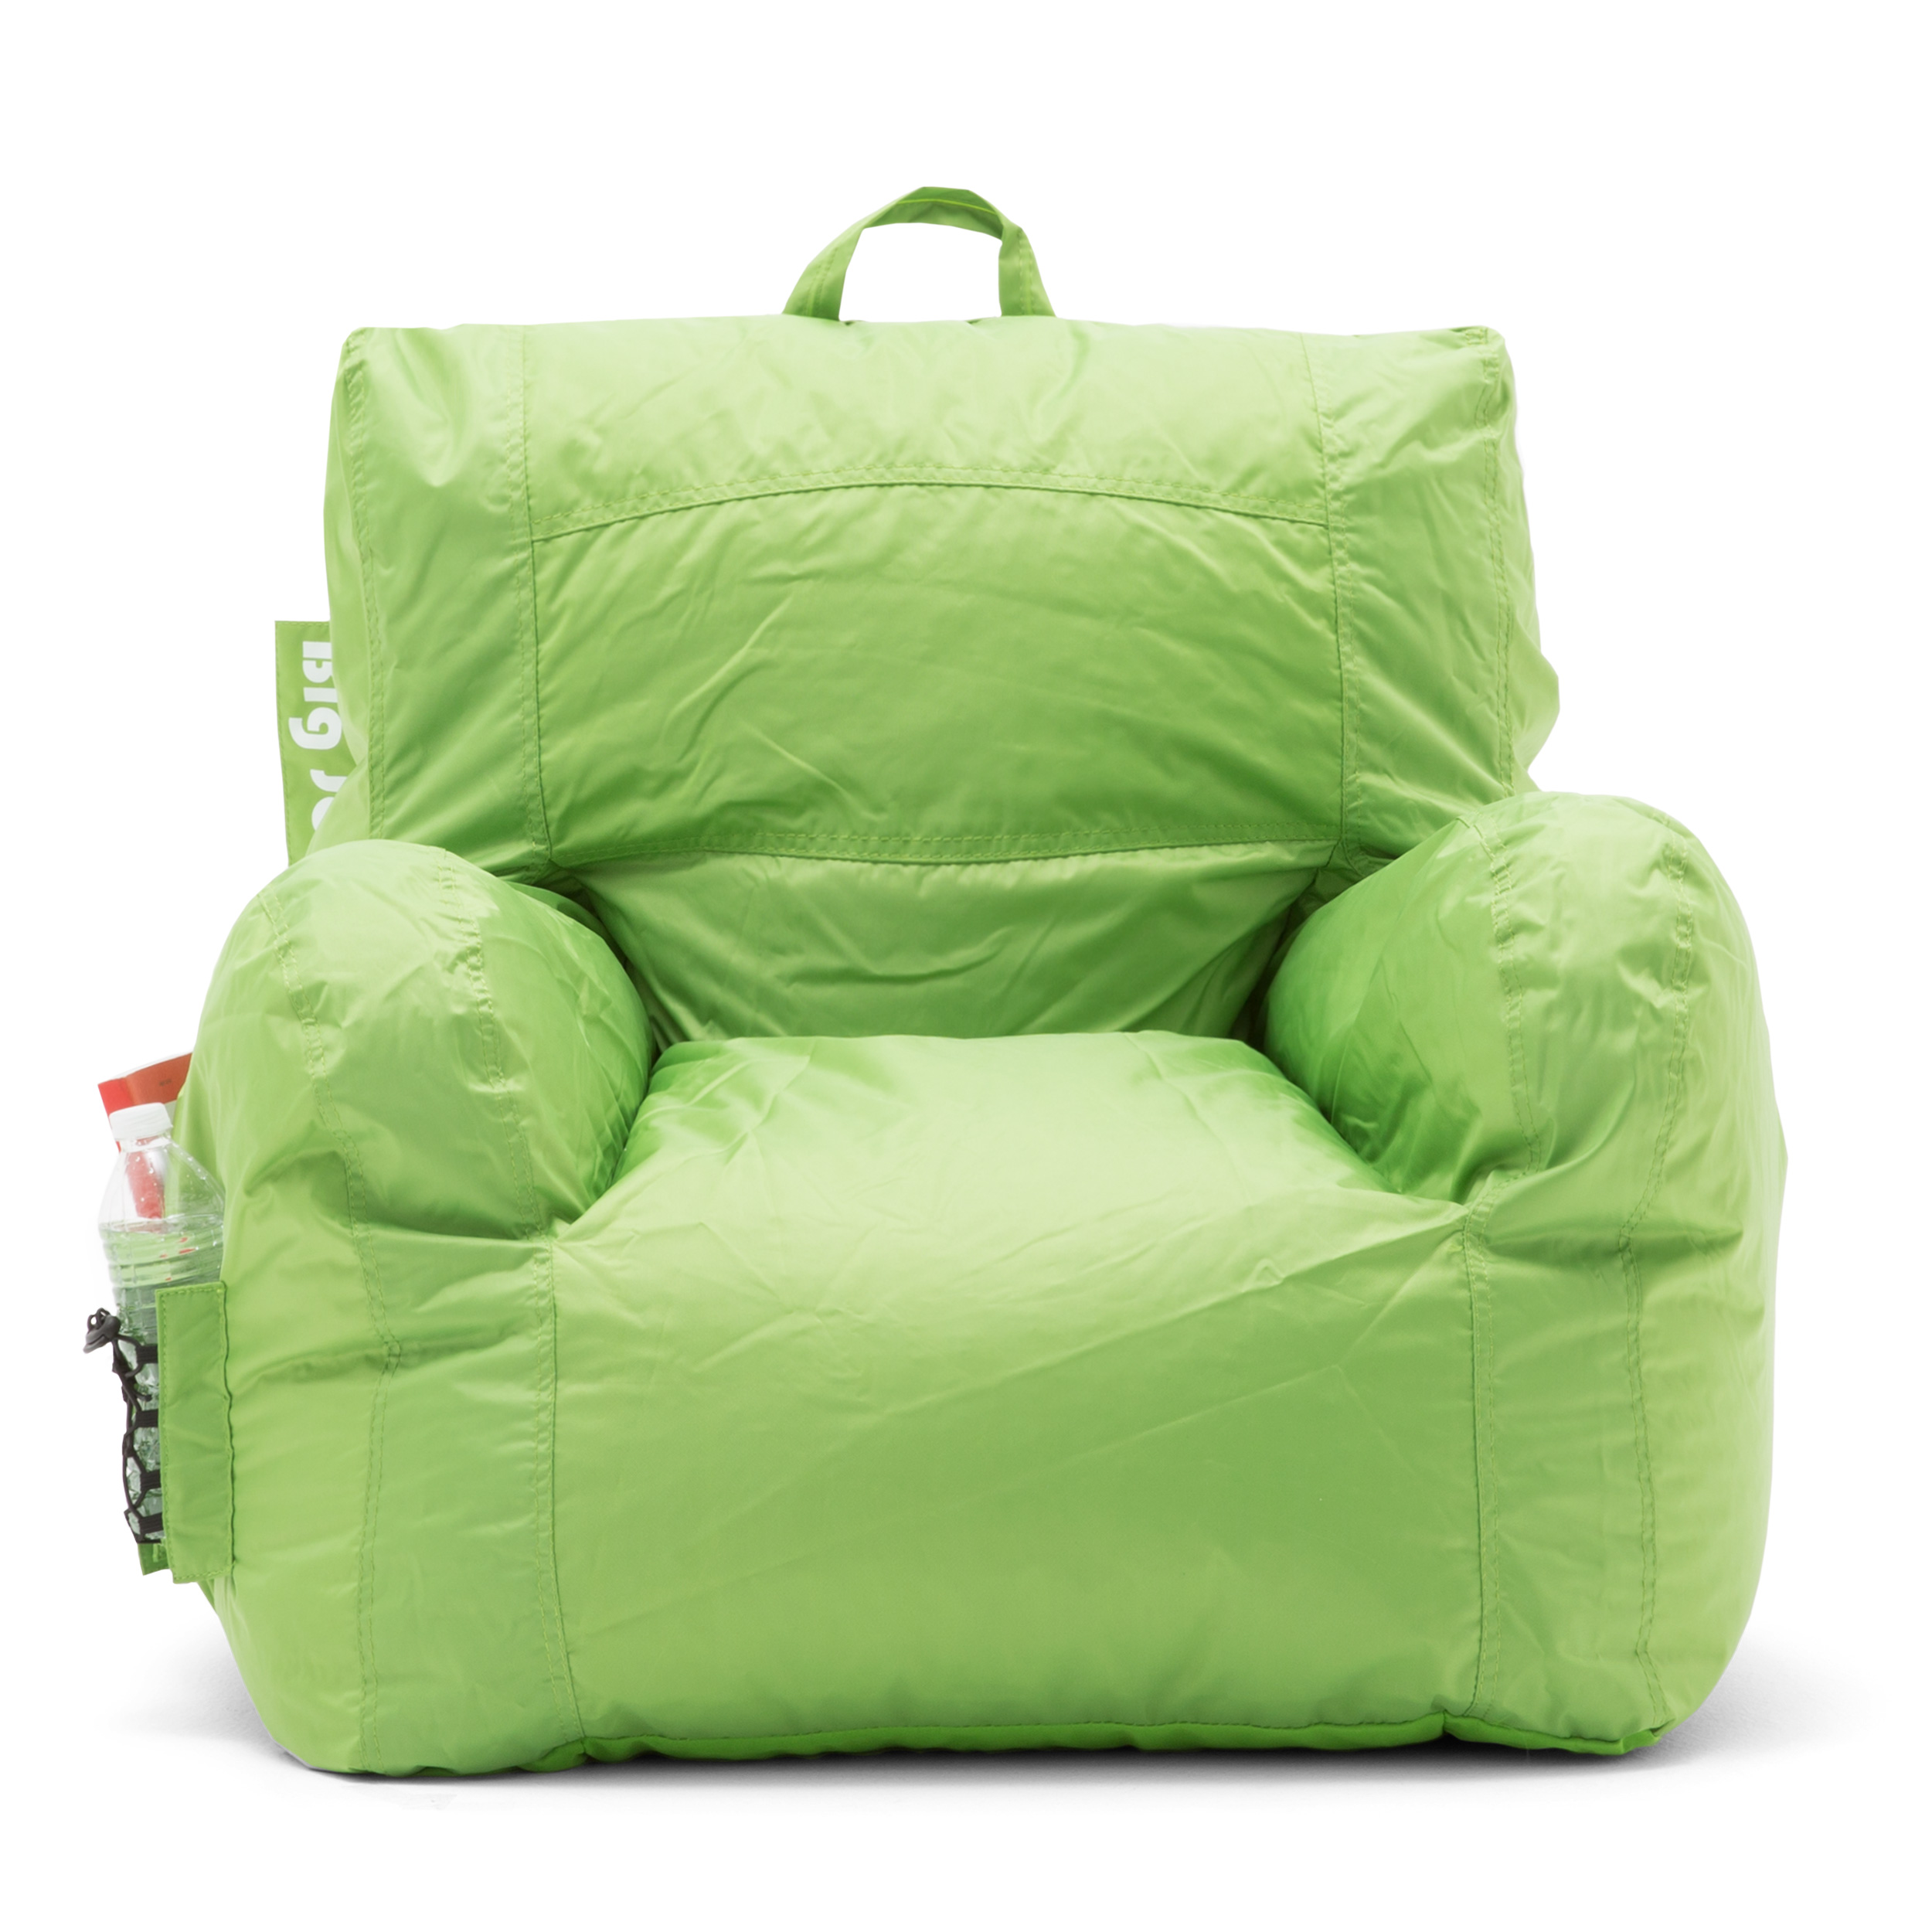 Awe Inspiring Big Joe Bean Bag Chair Multiple Colors 33 X 32 X 25 Ibusinesslaw Wood Chair Design Ideas Ibusinesslaworg